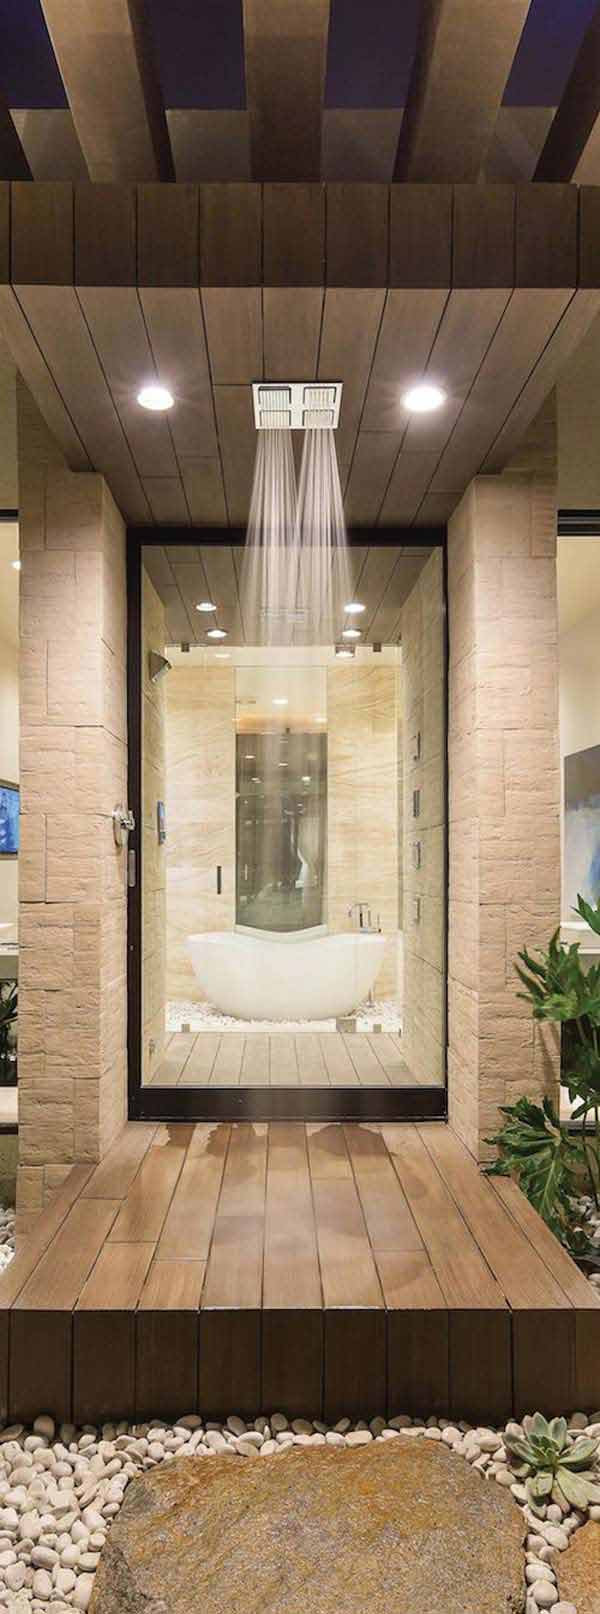 25+ Must See Rain Shower Ideas for Your Dream Bathroom ...